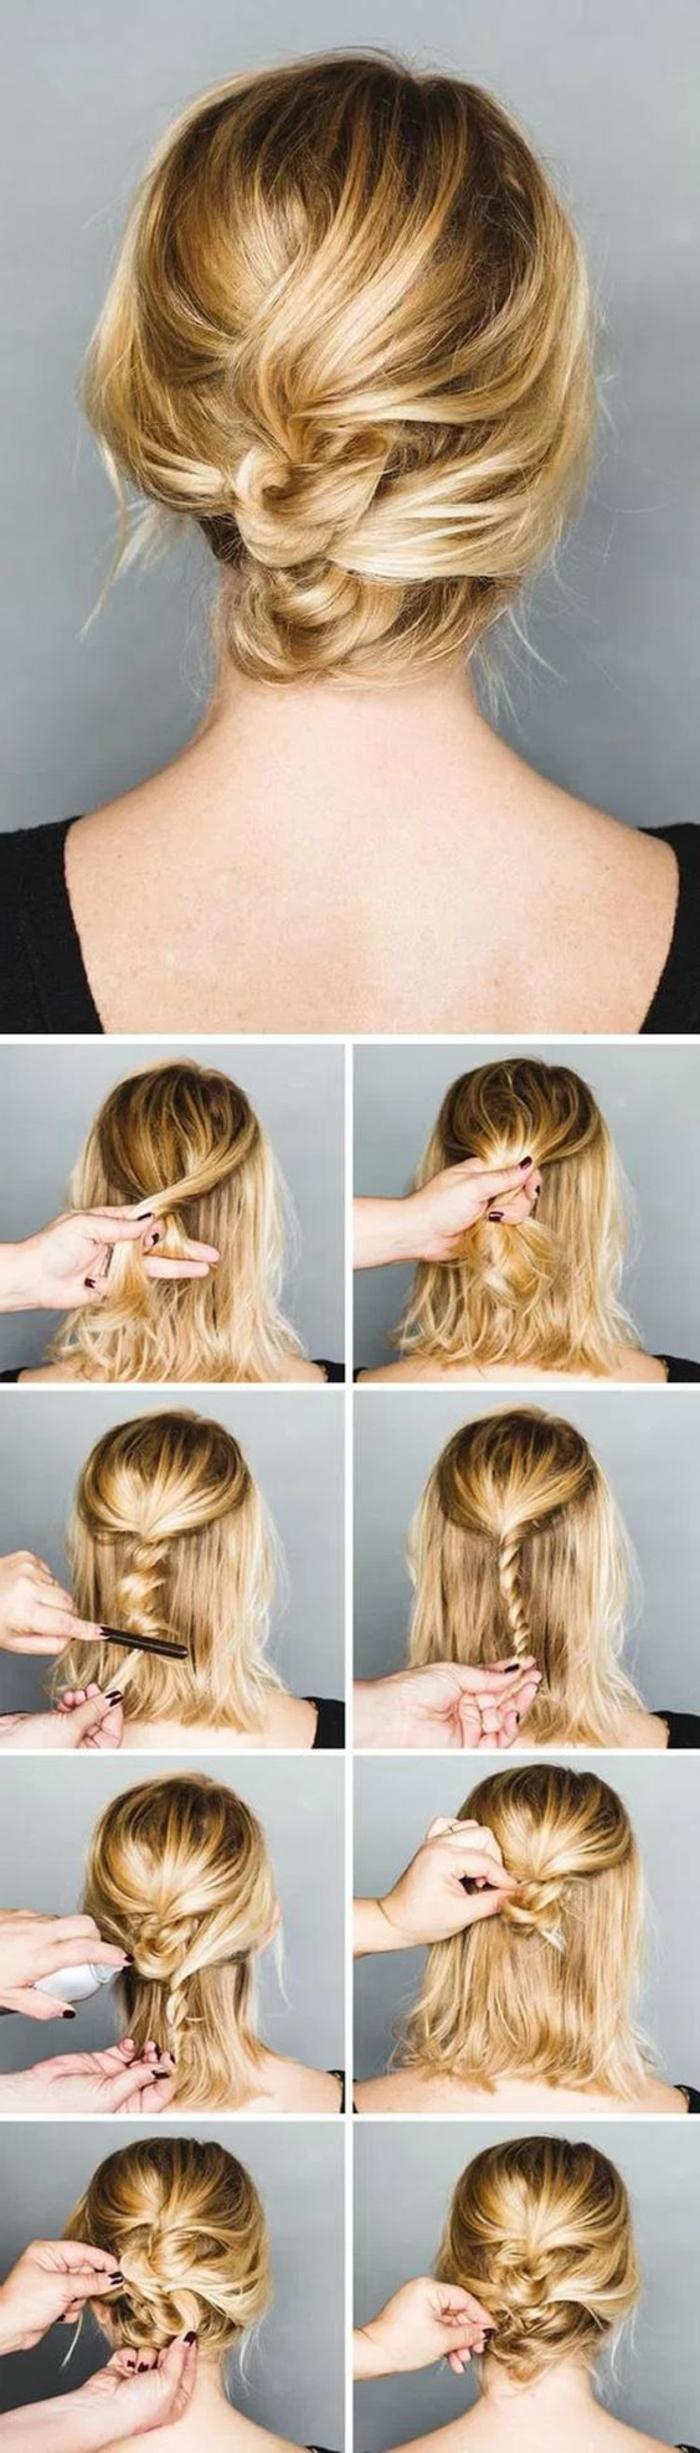 peinados-nochevieja-pelo-corto-rubio-recogido-fácil-de-hacer-paso-a-paso